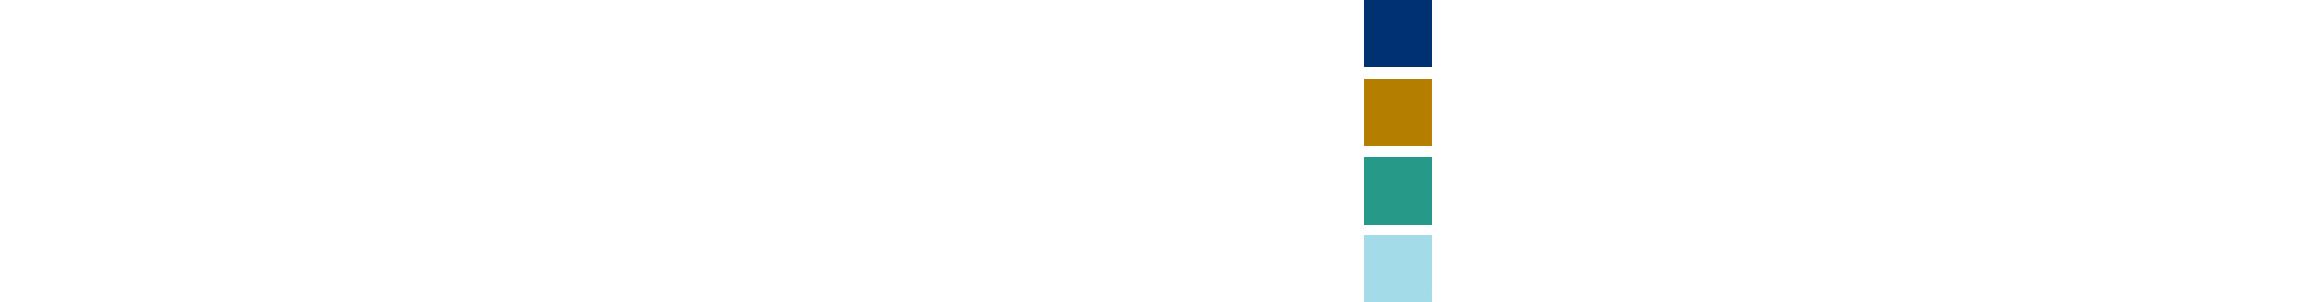 calero-mdsl-vector-recolor-white